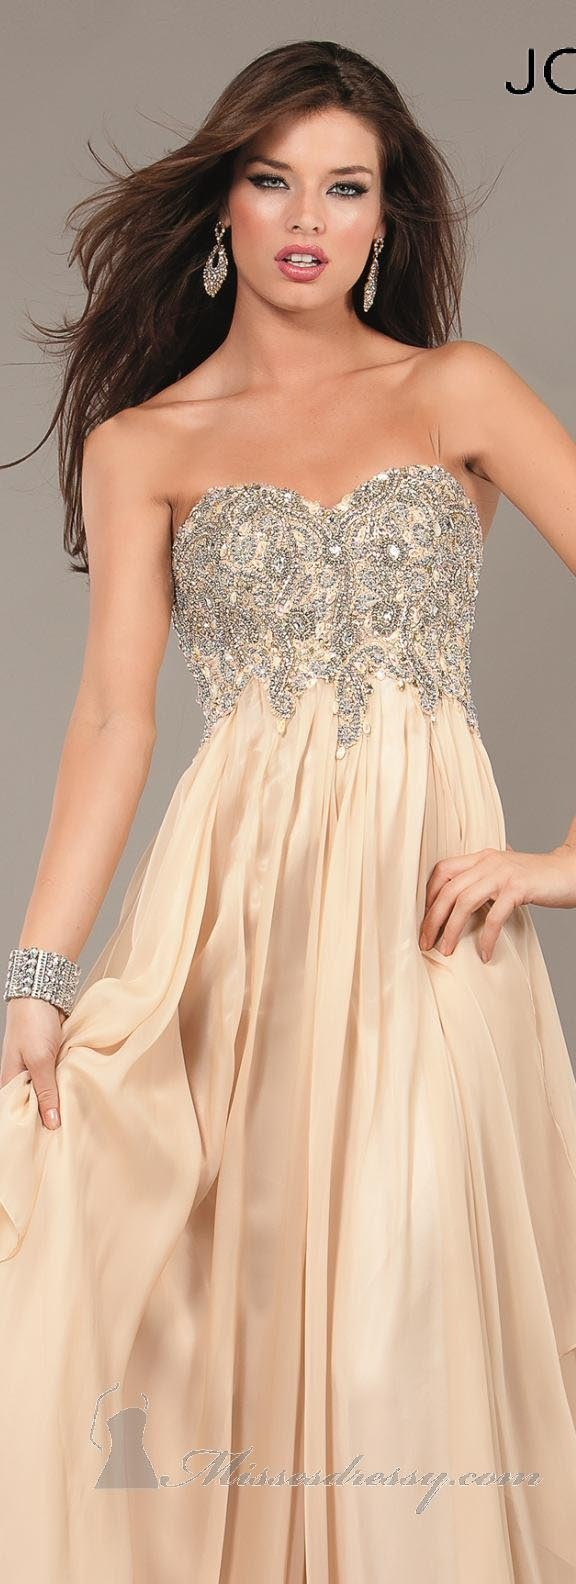 Jovani Prom 2013 #long #formal #dress #crystal #evening #dresses #strapless #nude